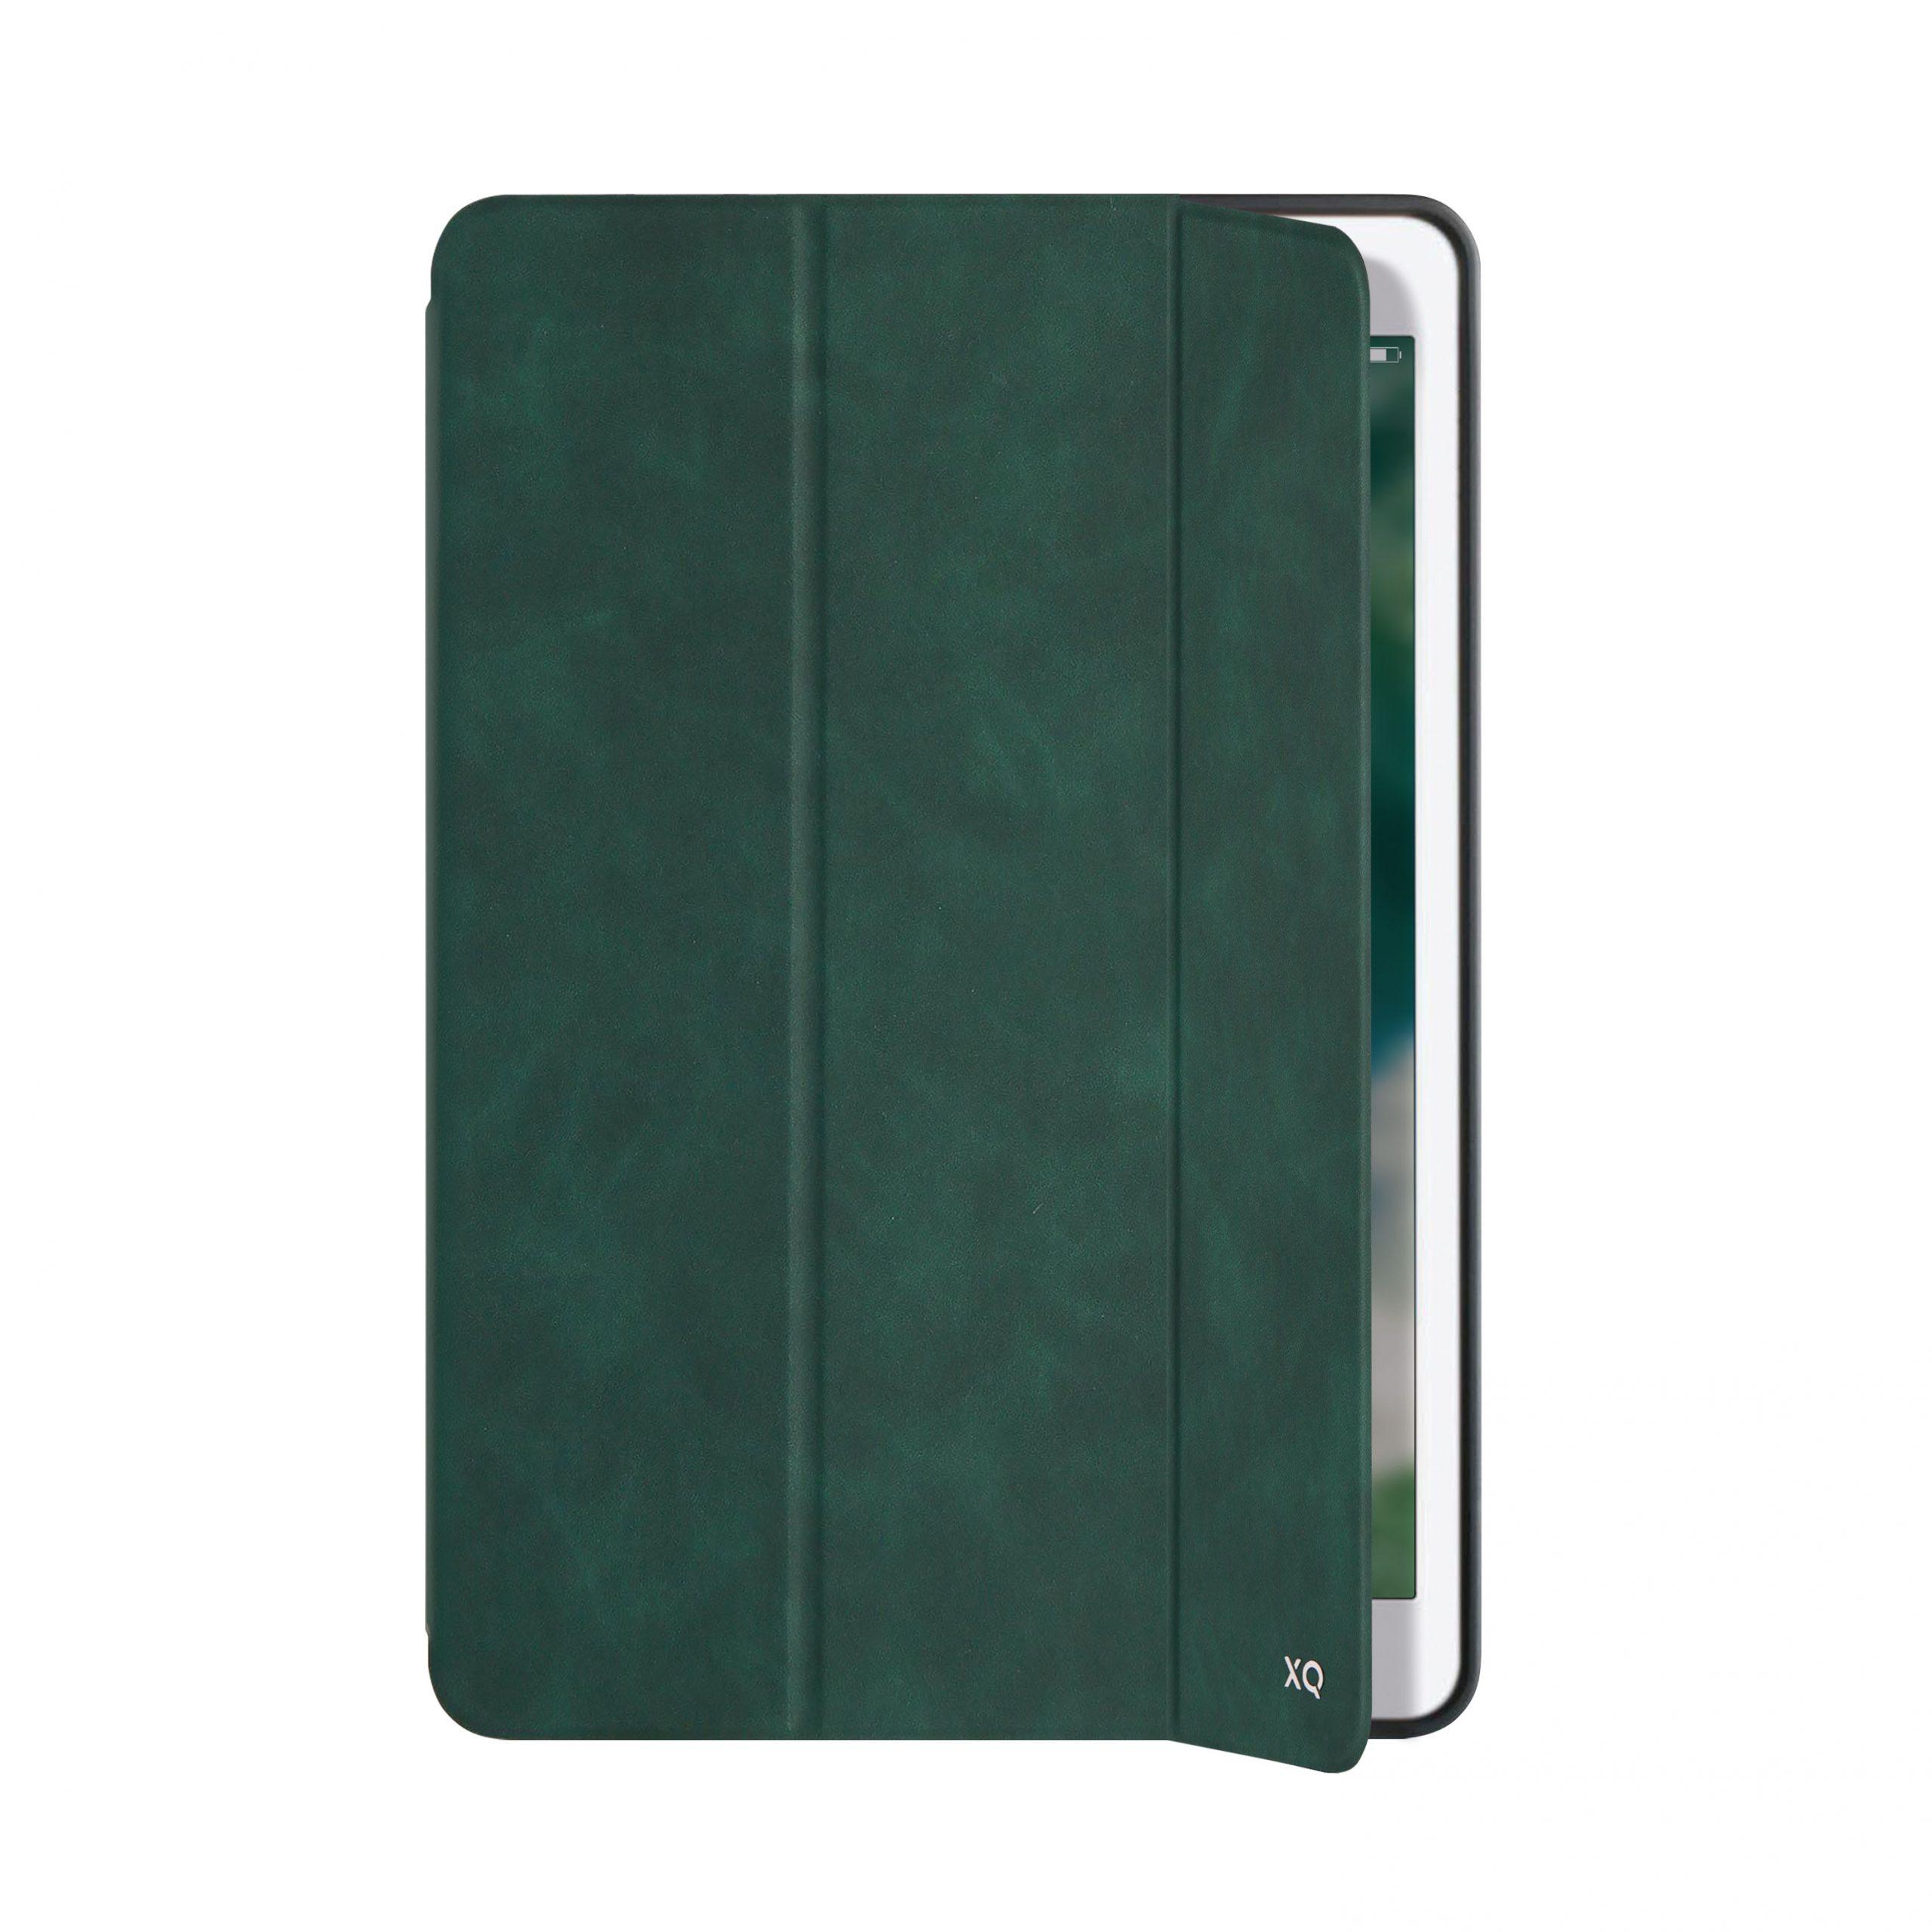 Pouzdro / kryt pro iPad 10.2 (2019/2020) - Xqisit, Piave Green